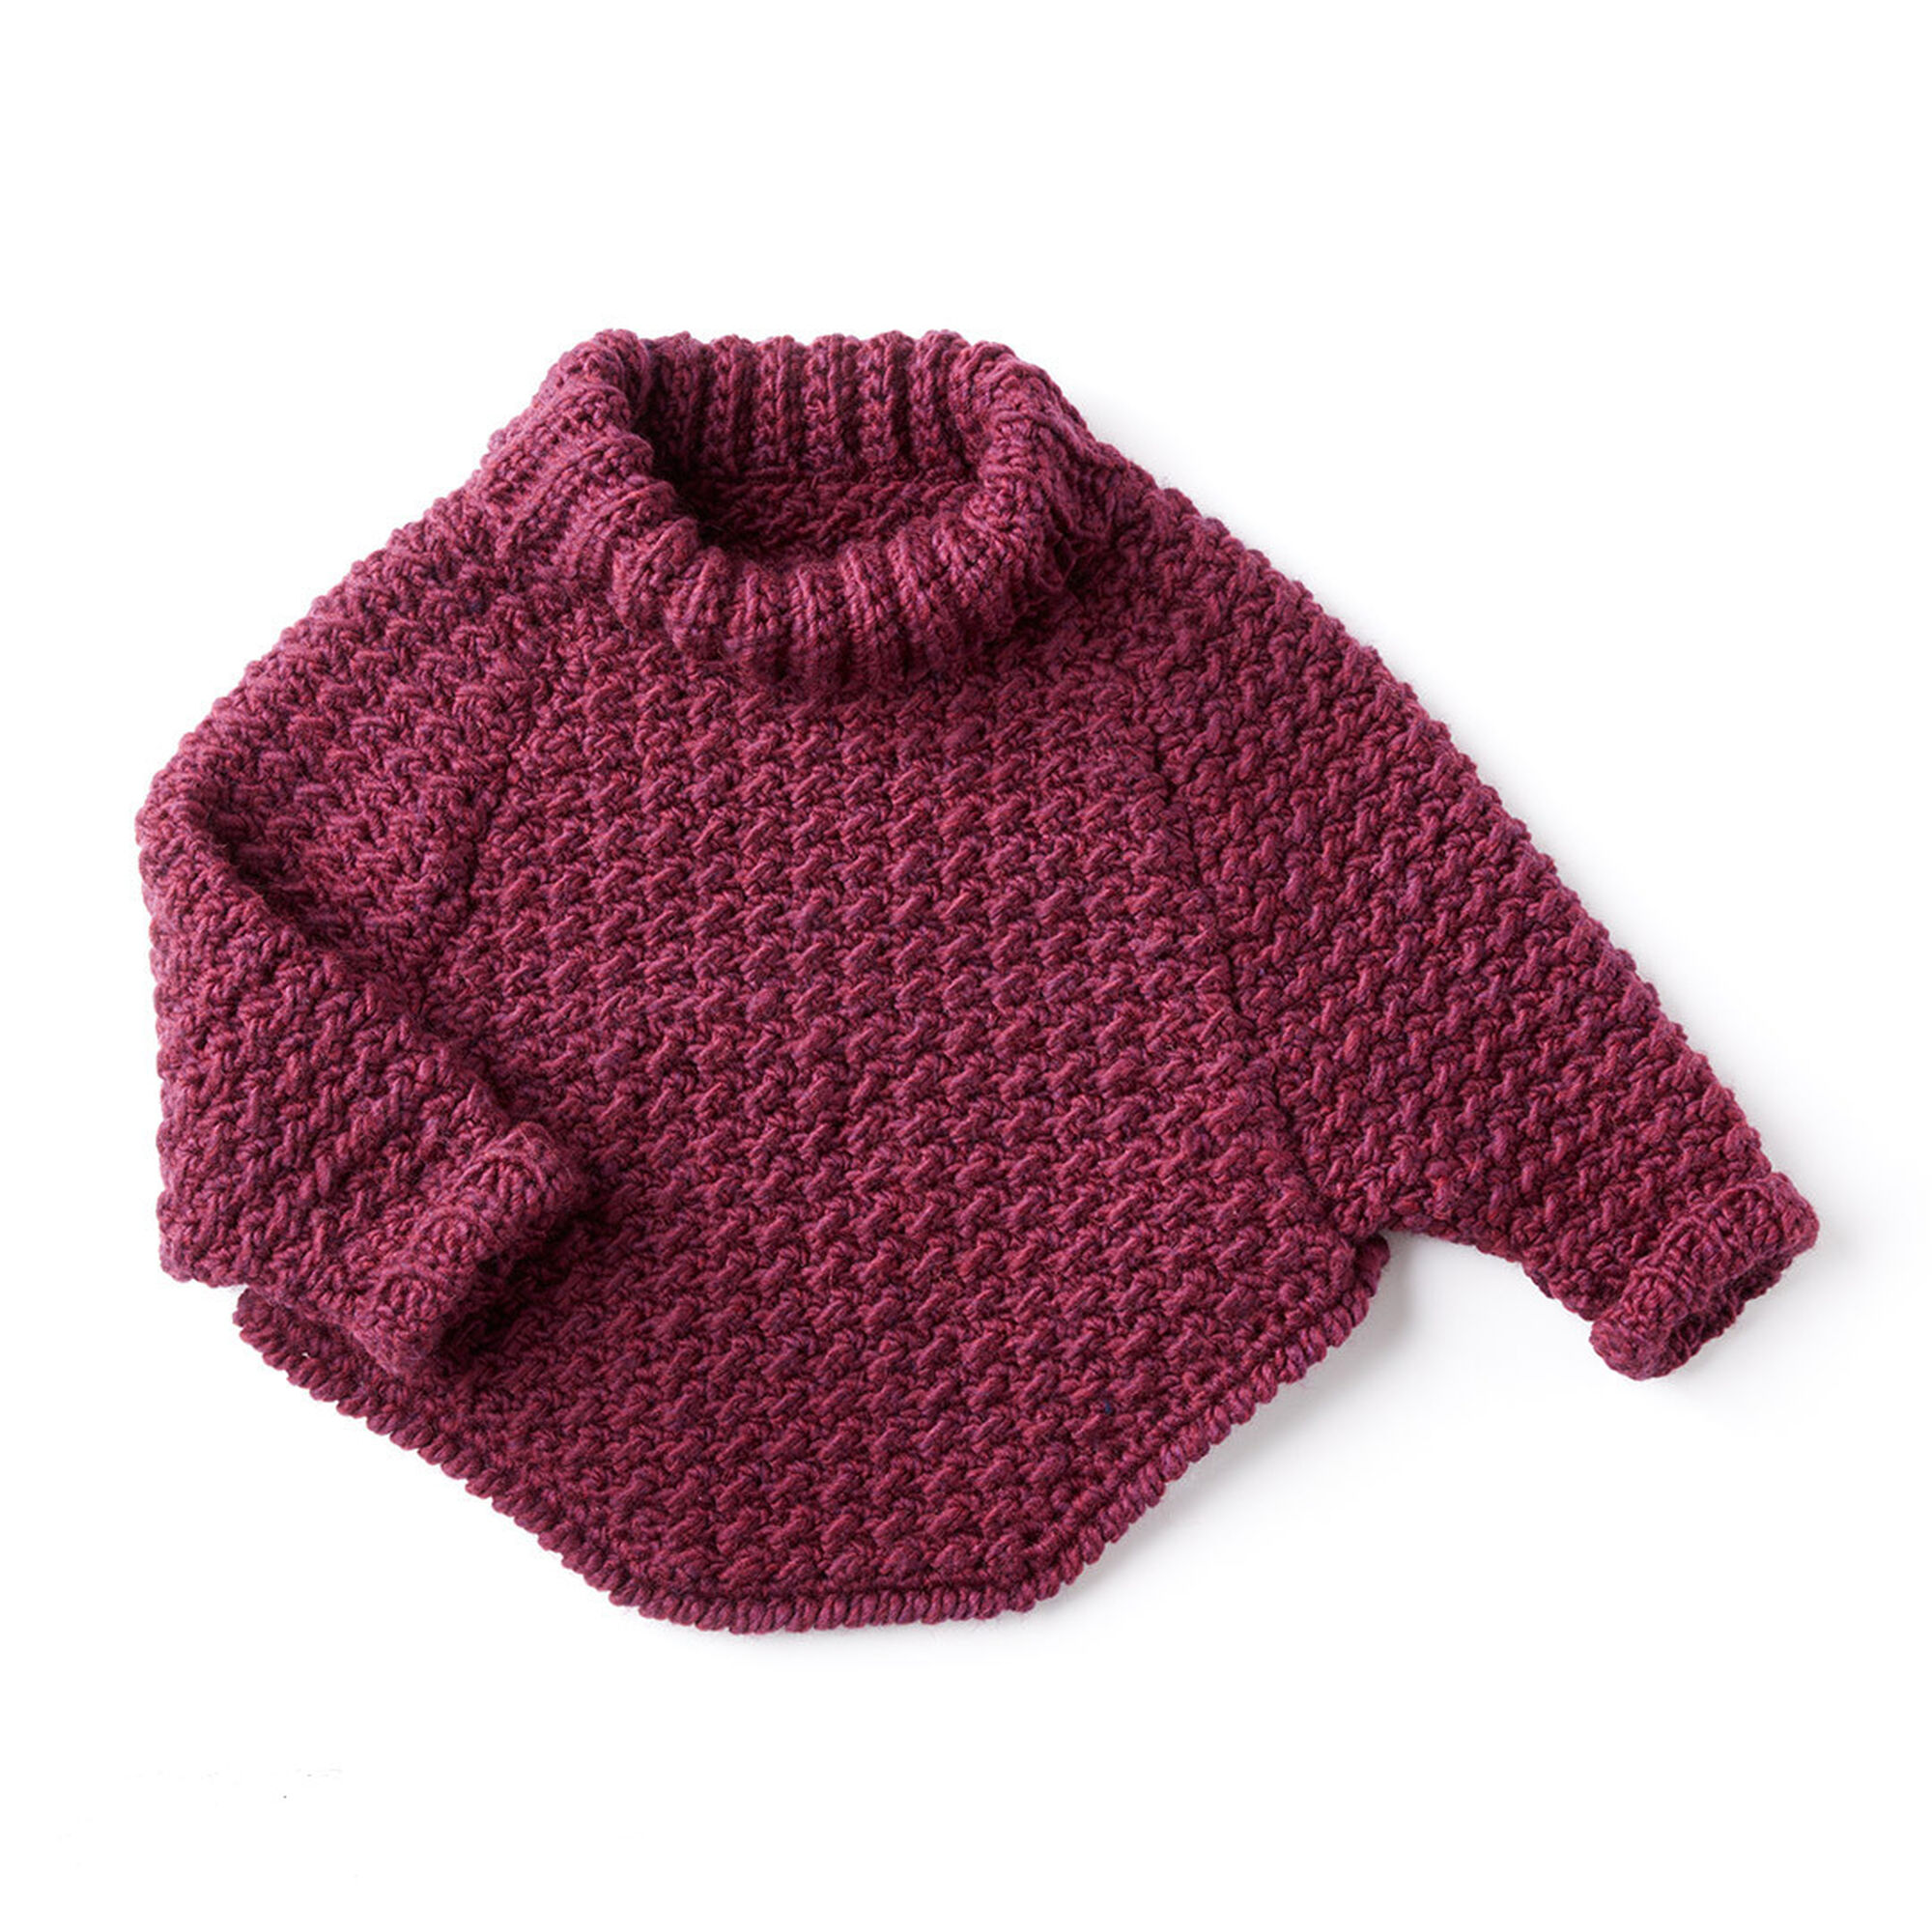 Bernat Kids Curvy Crochet Cowl Pullover, 6 yrs | Yarnspirations